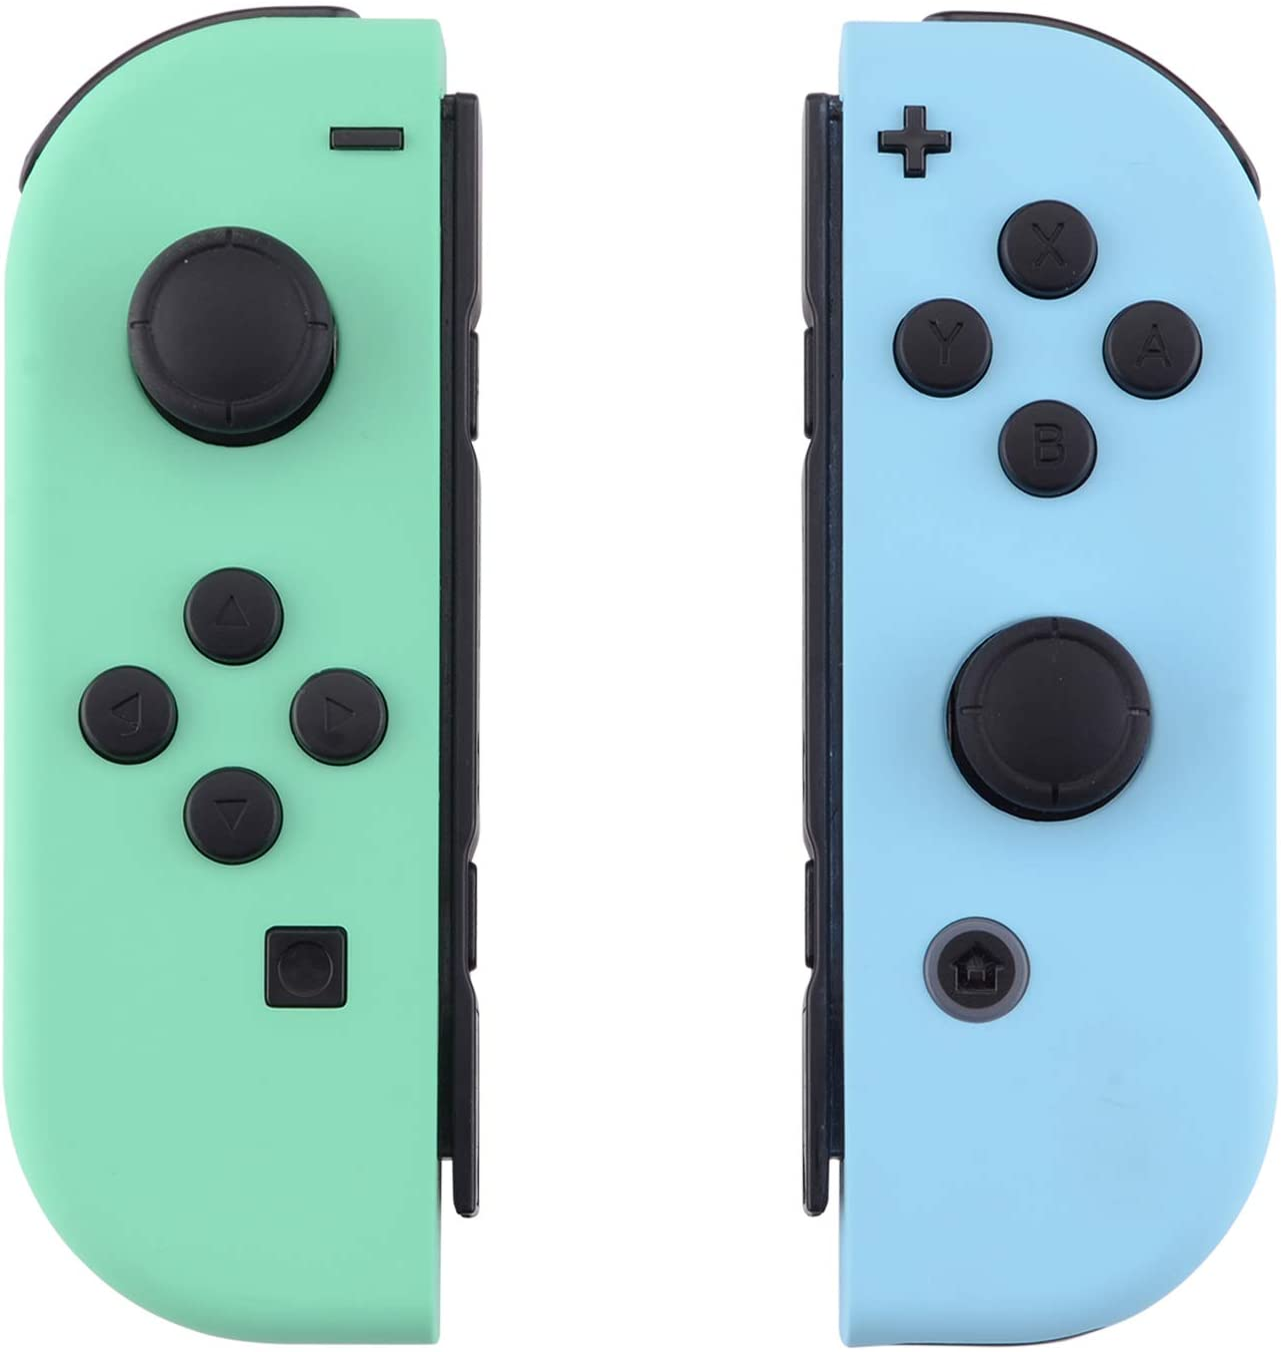 eXtremeRate Carcasa para Joy-Con Nintendo Switch Funda de Grip de reemplazo Tacto Suave Shell con Botón completo Case para Joycons Nintendo Switch-No incluye Carcasa de Consola(Menta Verde&Cielo Azul): Amazon.es: Electrónica